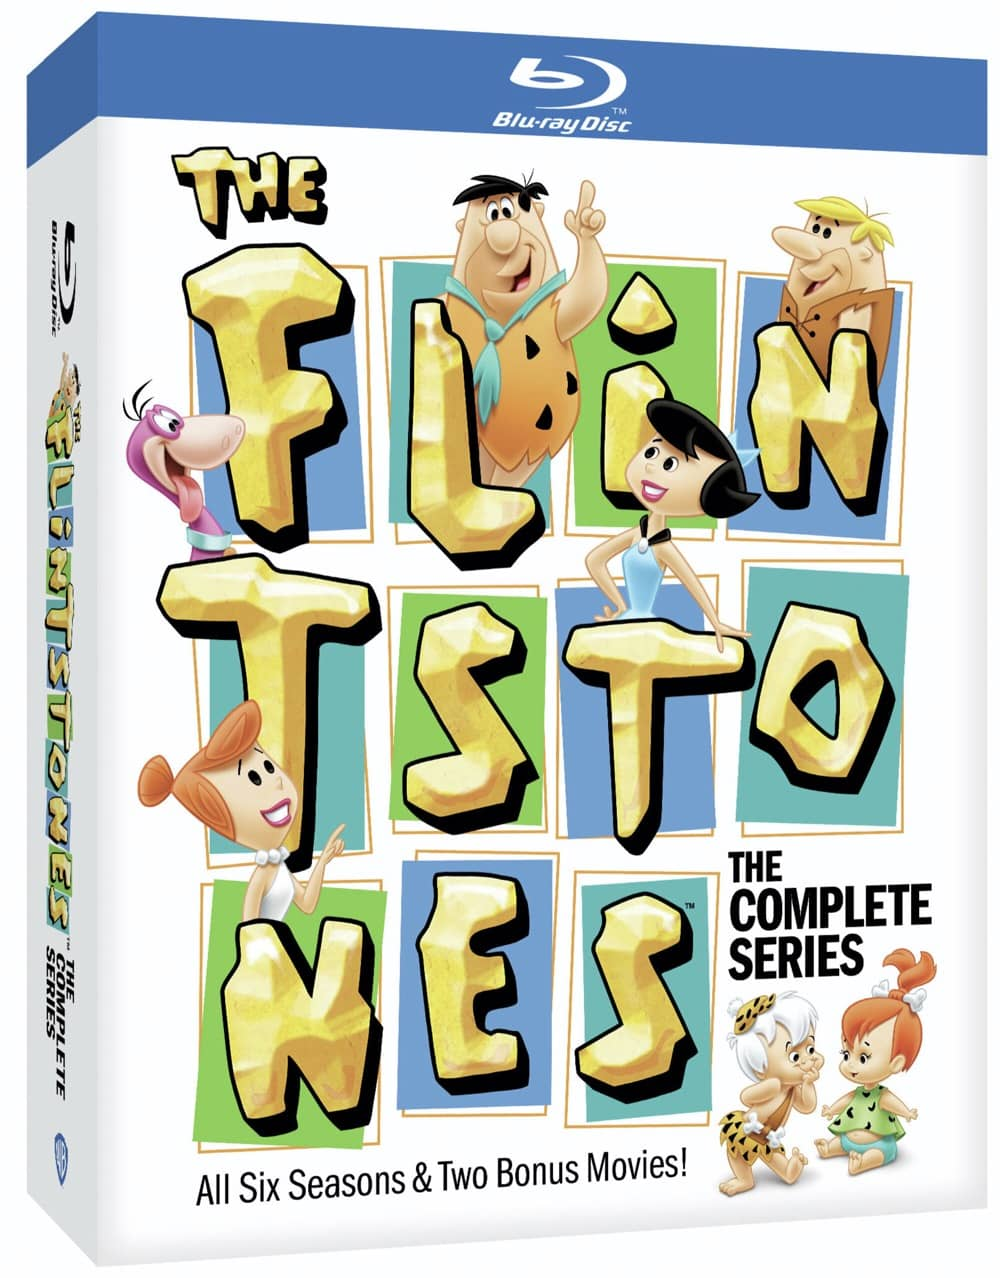 The Flintstones Bluray Set Cover Artwork